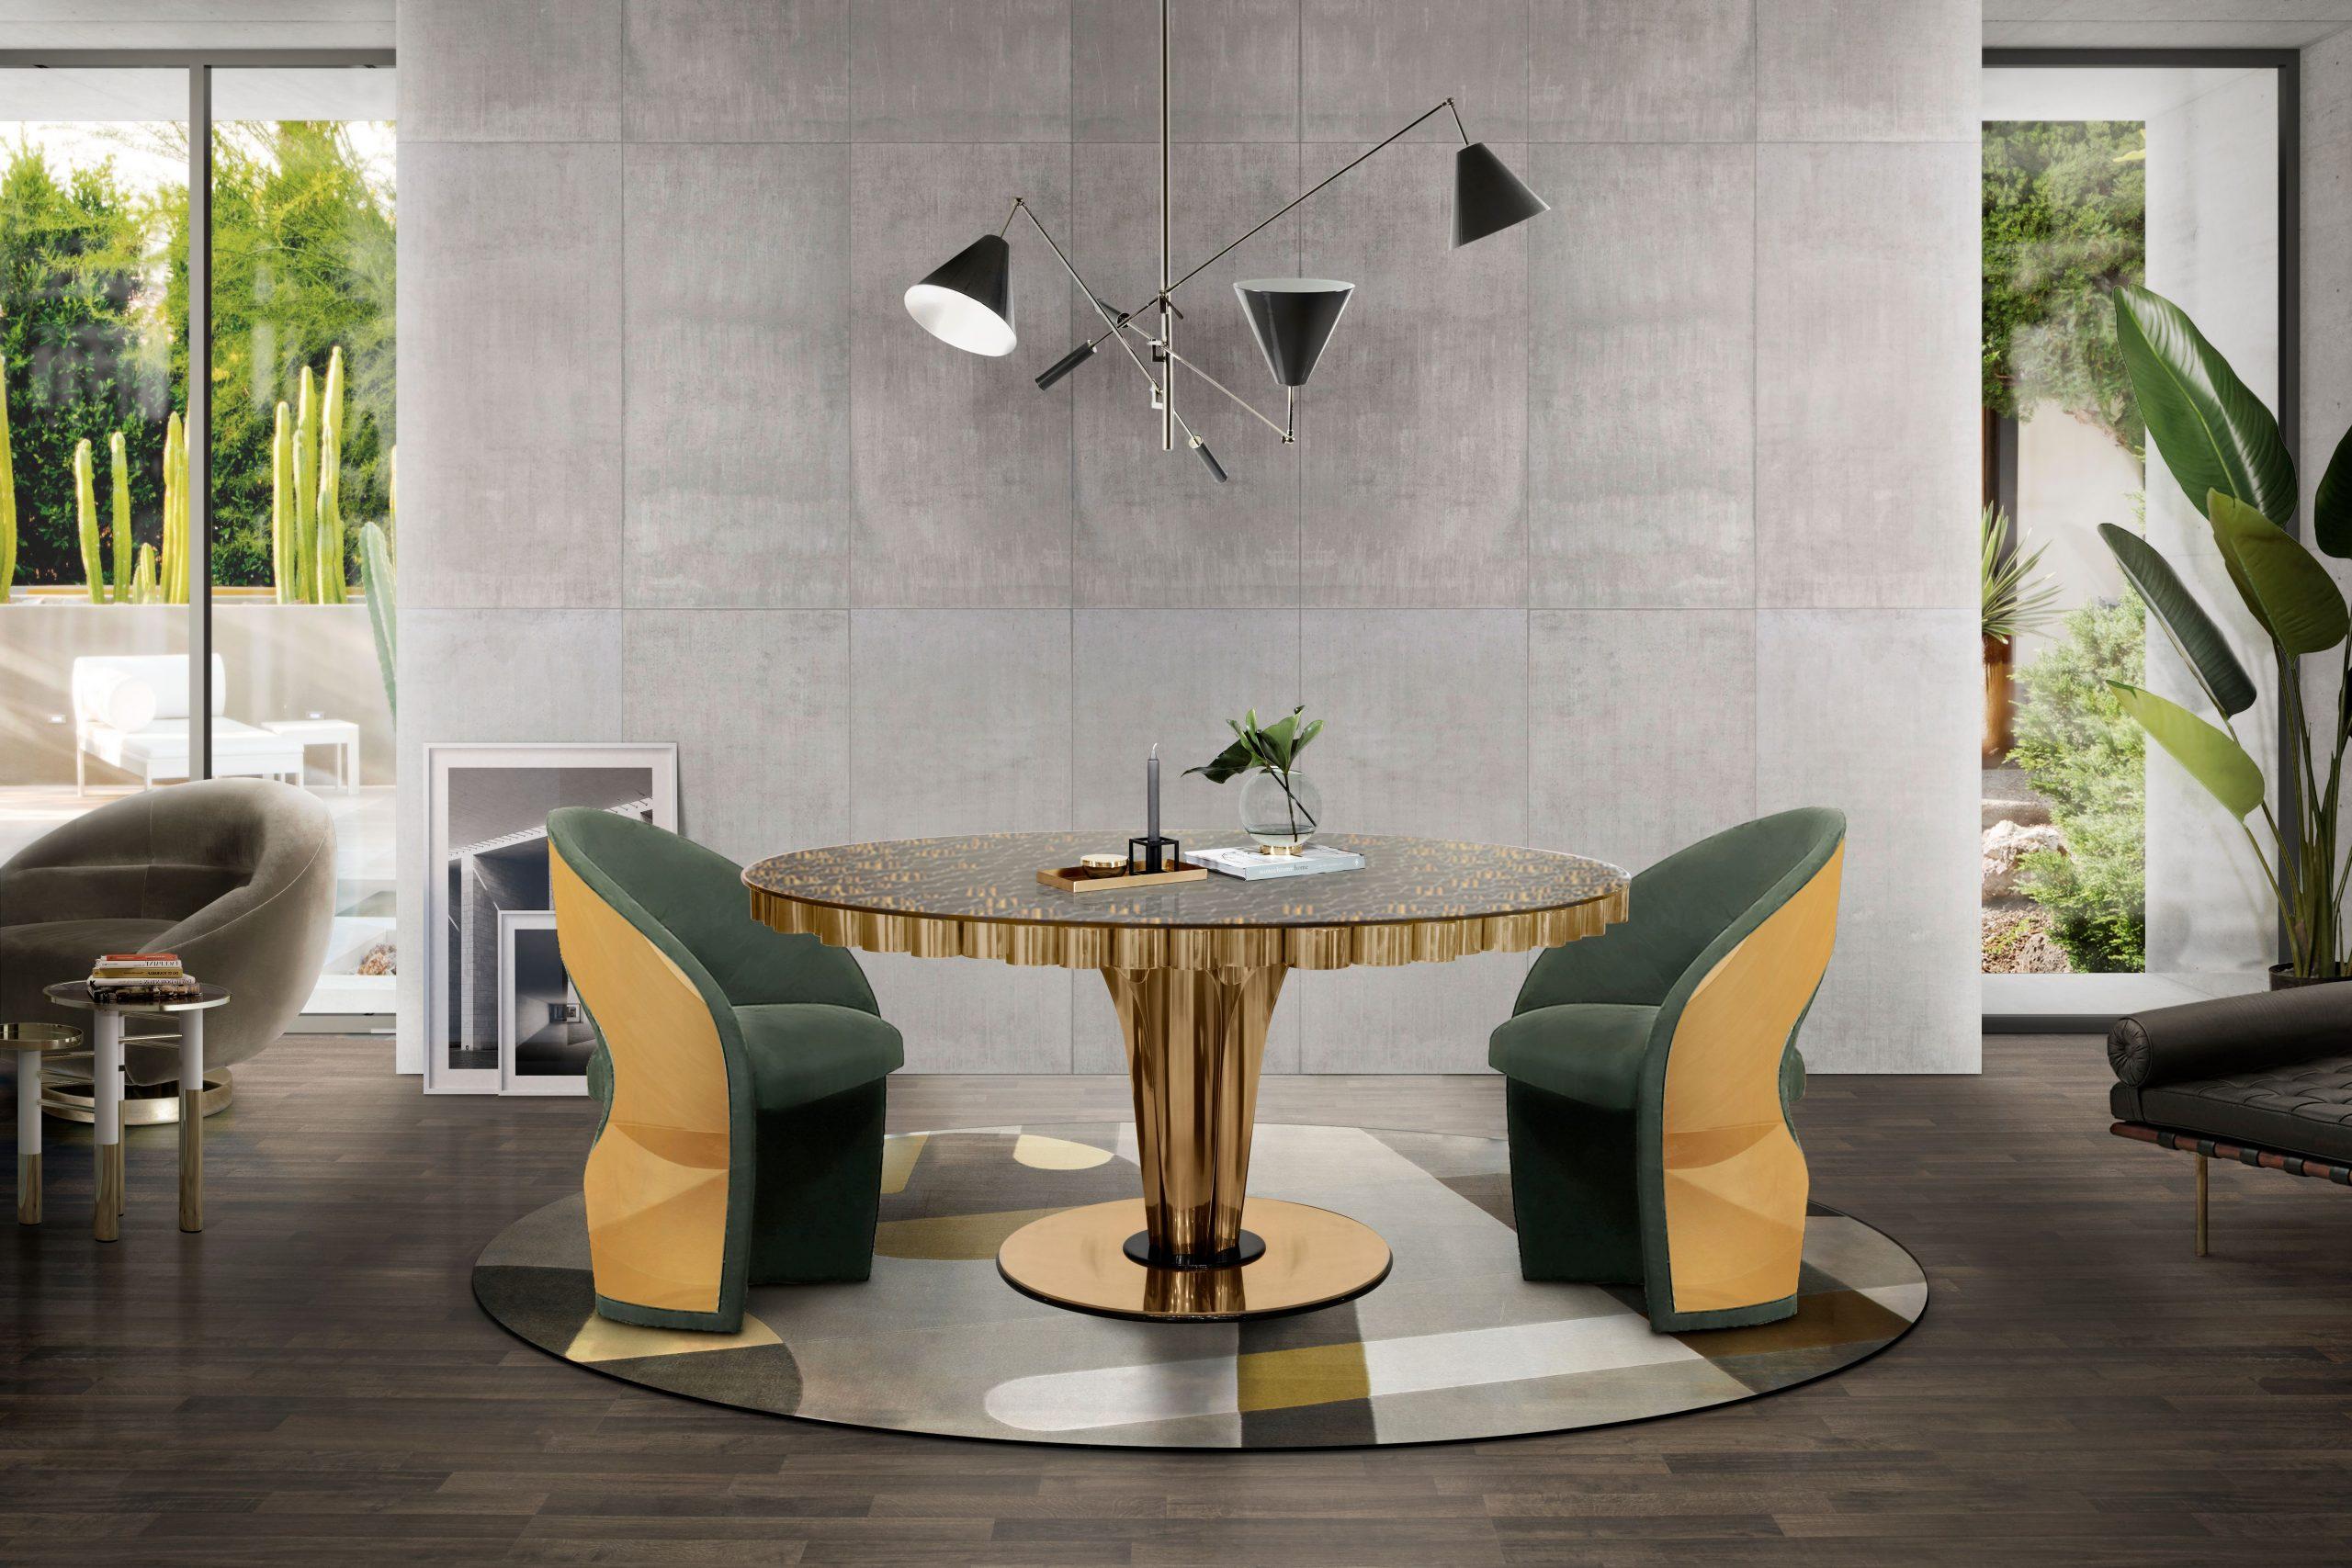 5 mid-century modern rug ideas - Mid-century Dining Room